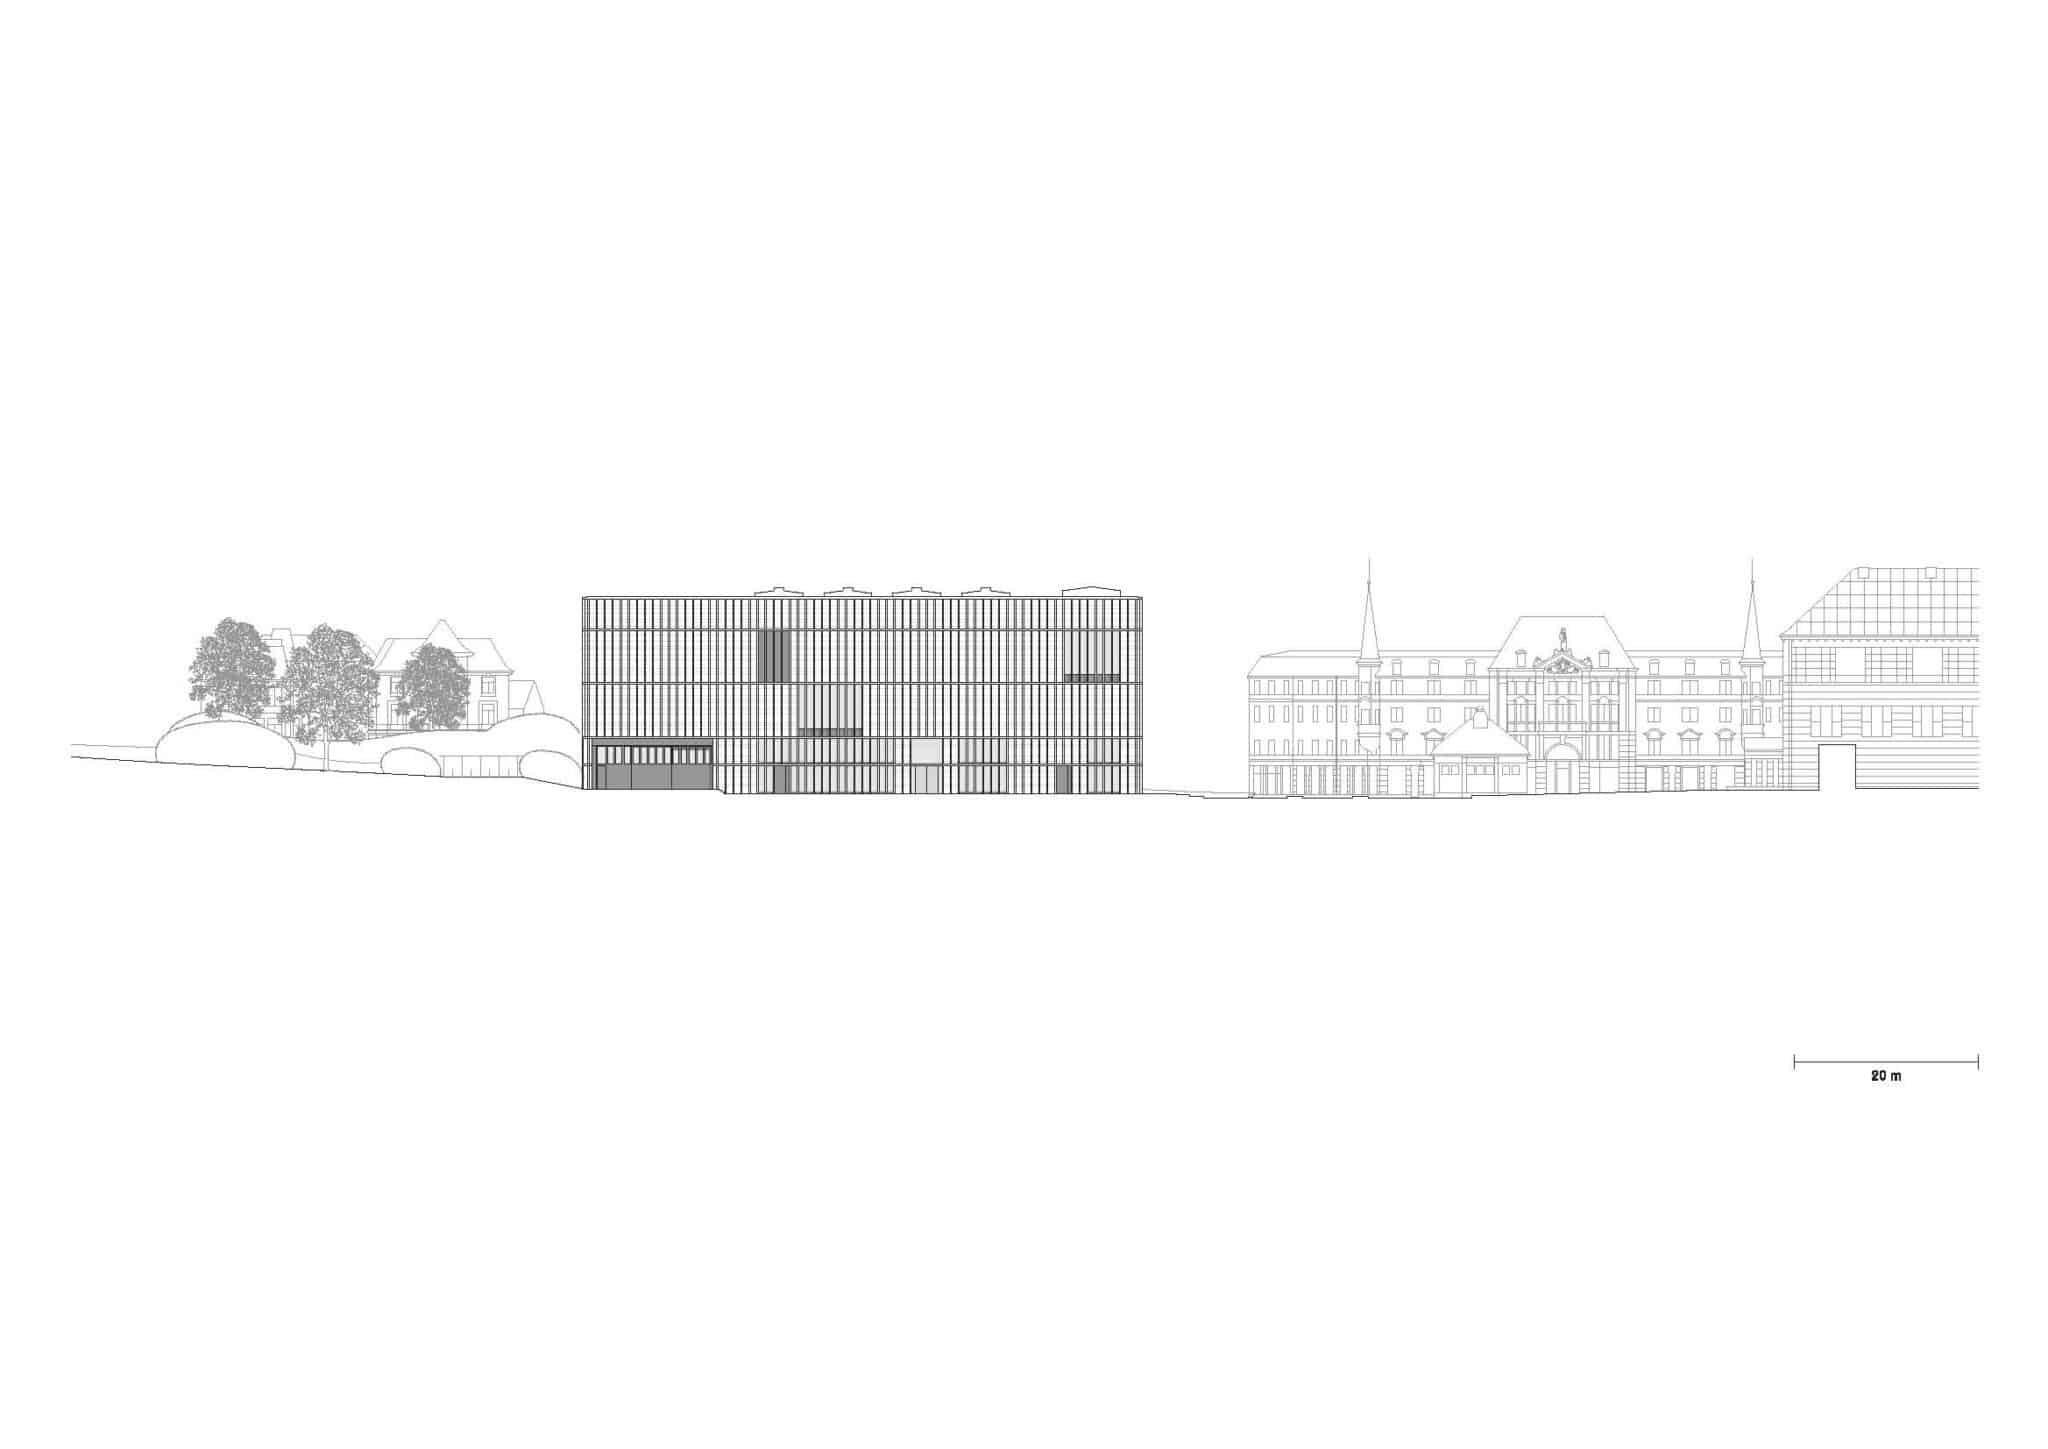 Kunsthaus Zürich  - 20210712 Chipperfield Kunsthaus 12.2.4 65